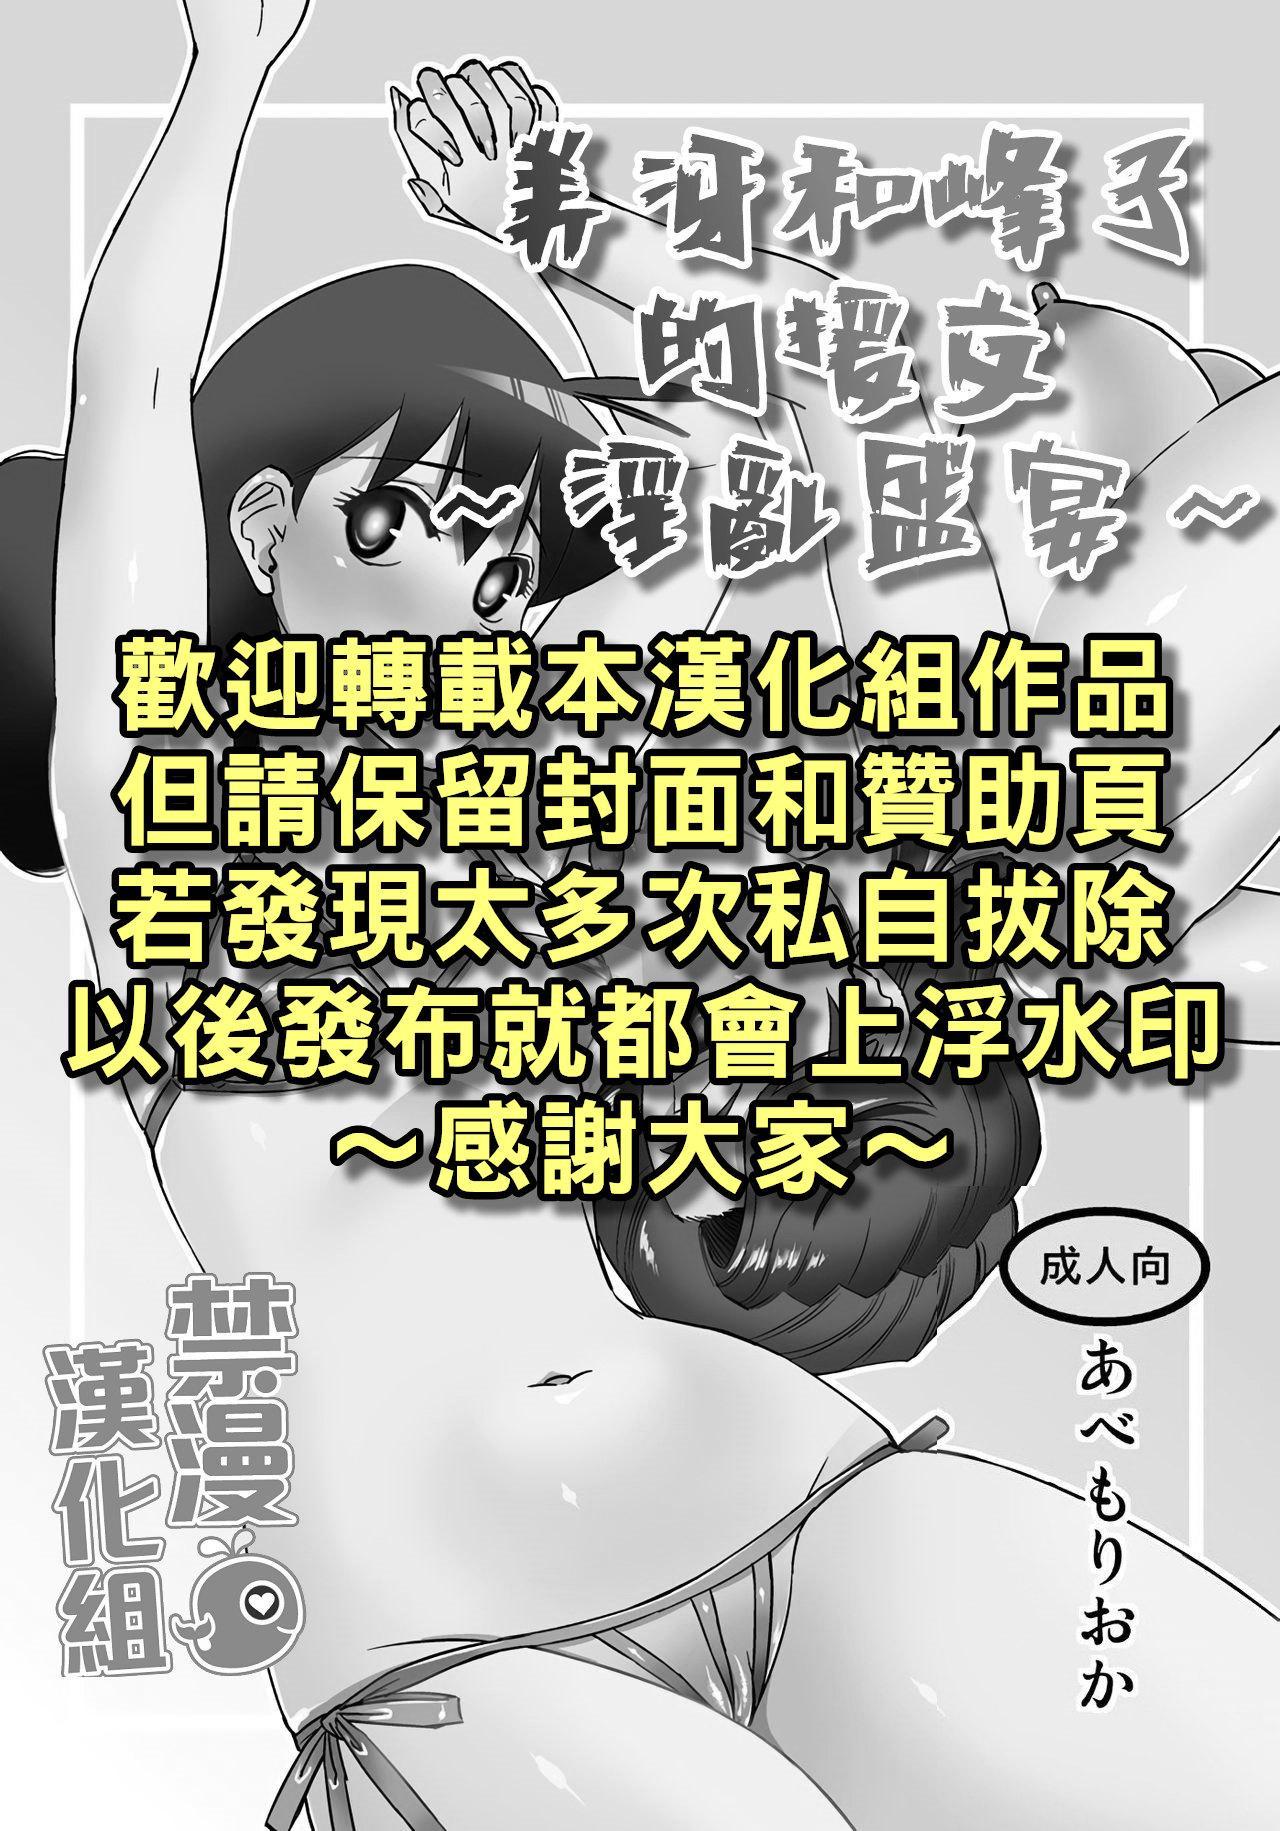 Misae to Mineko no Enkou de Rankou    美冴和峰子的援交~淫亂盛宴~ 1